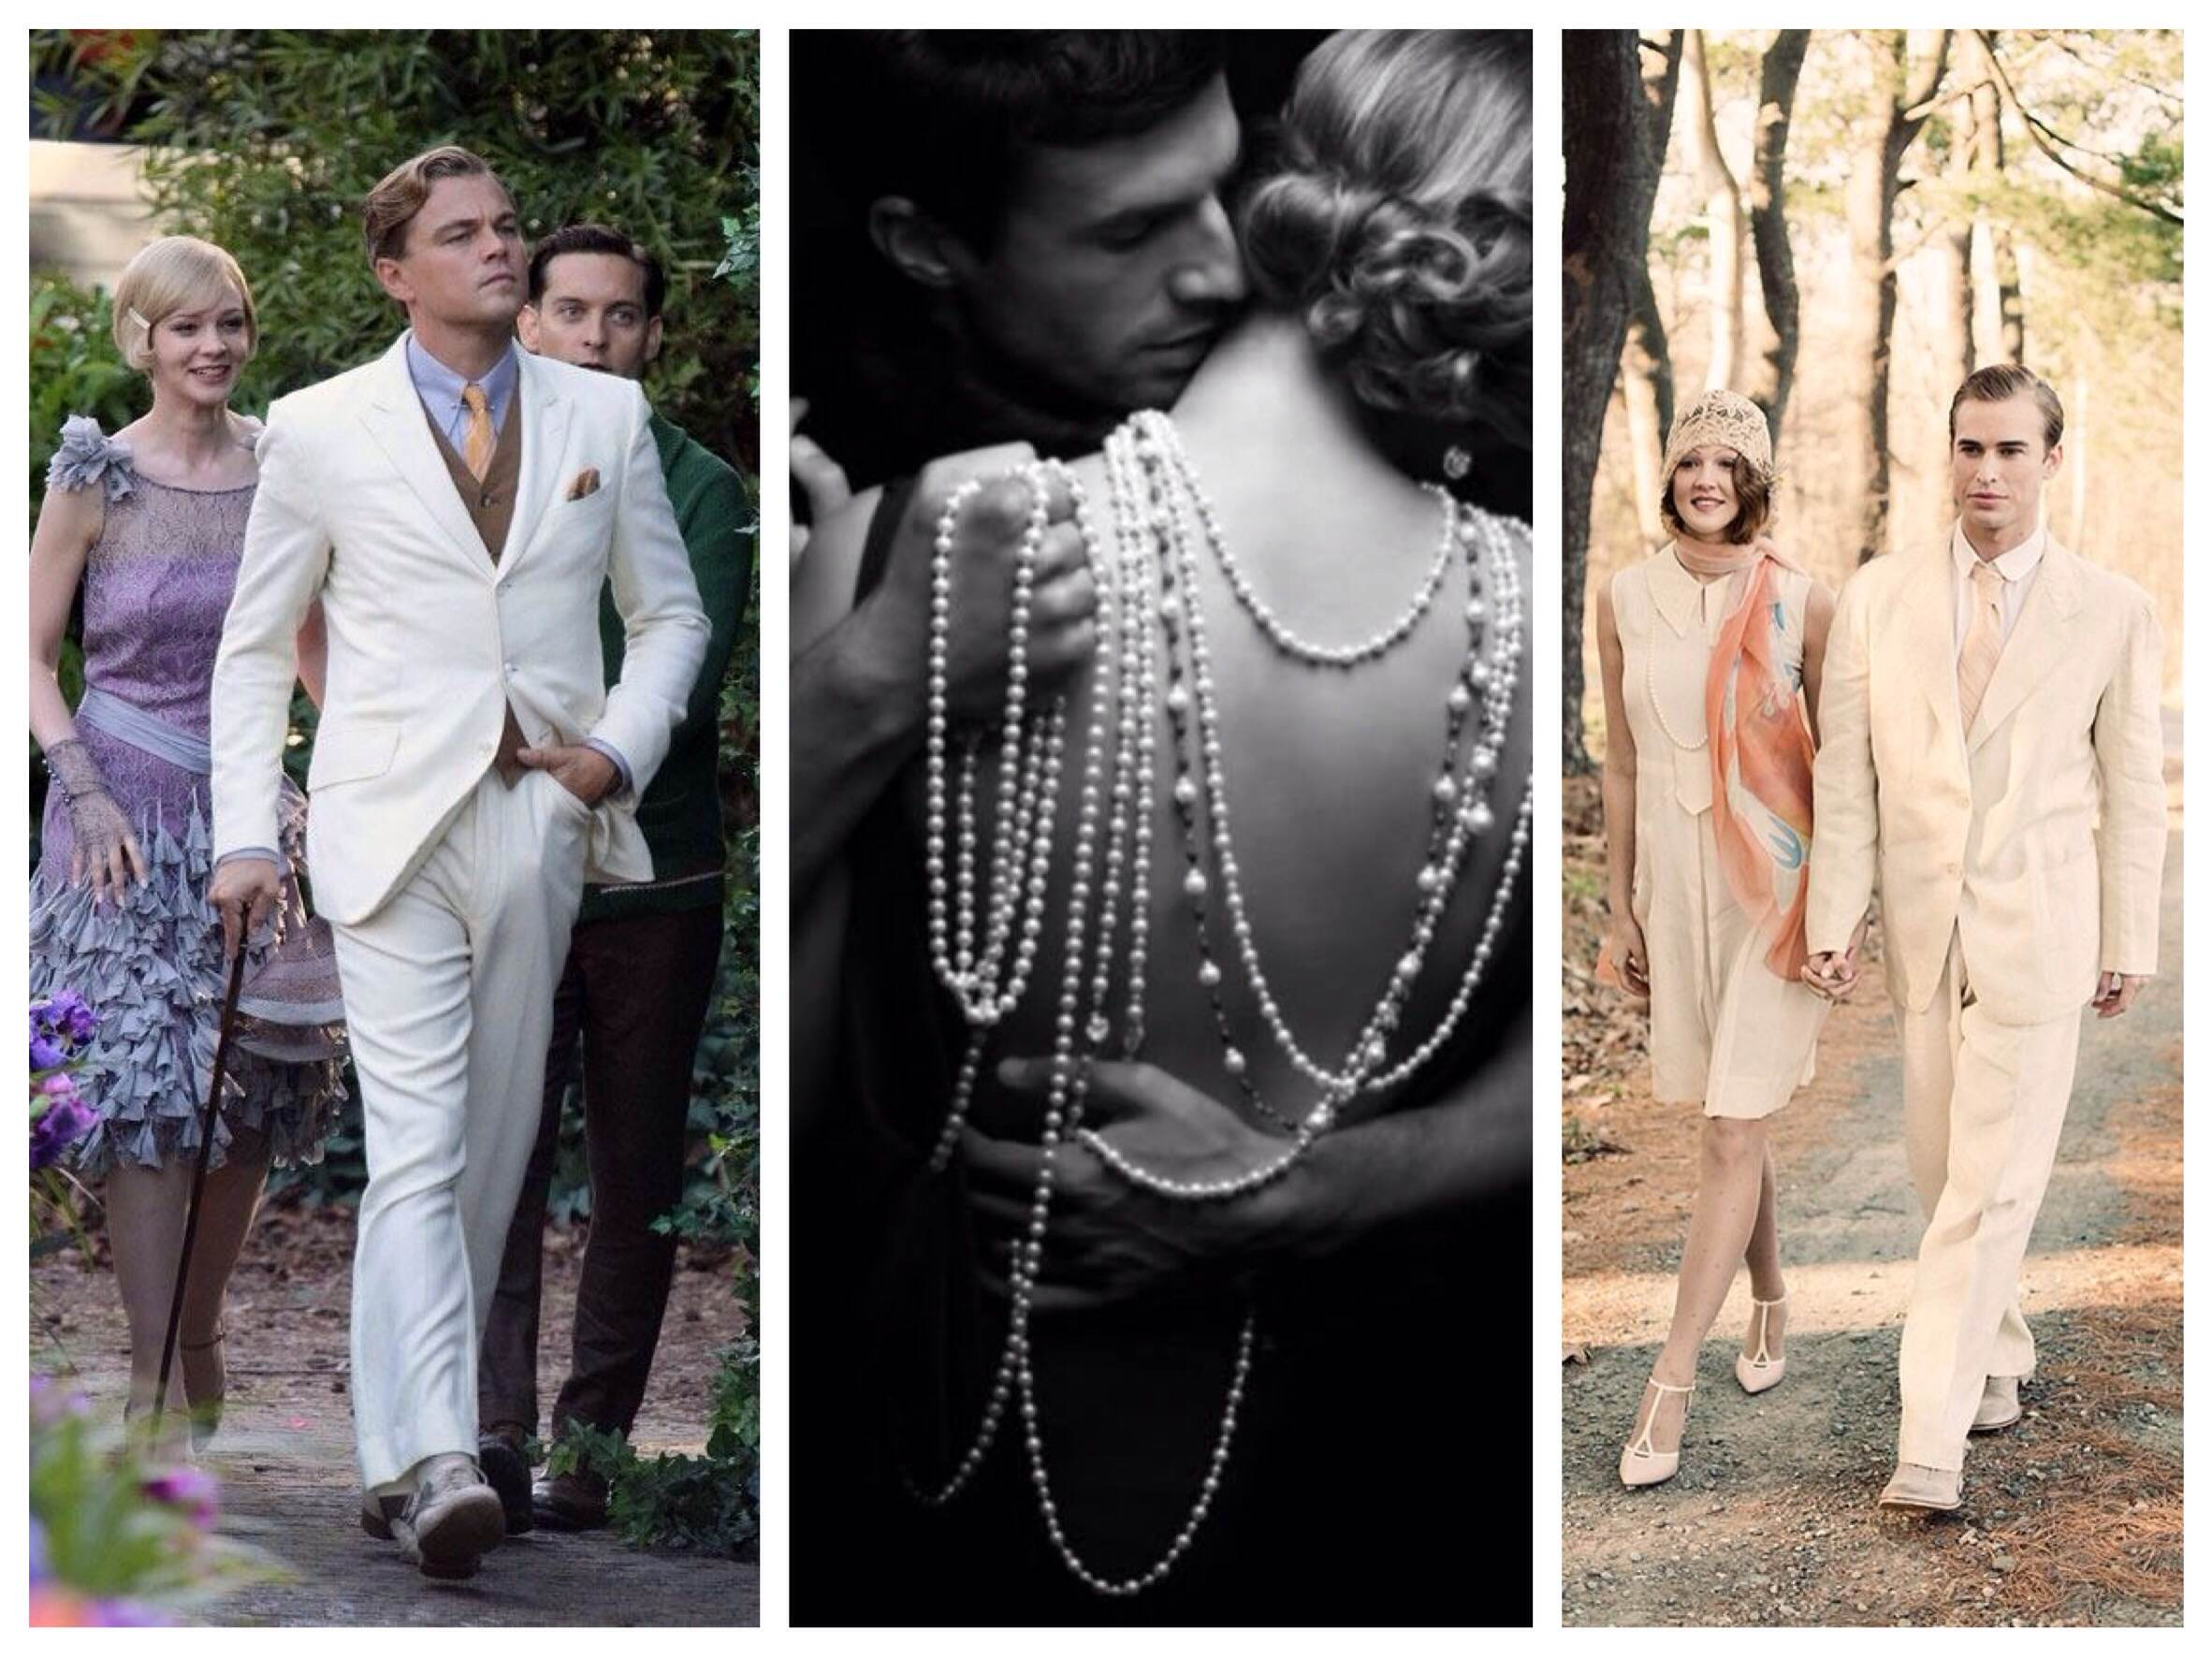 Одежда в стиле 20-х годов  фото, видео, рекомендации e07406a4fb3